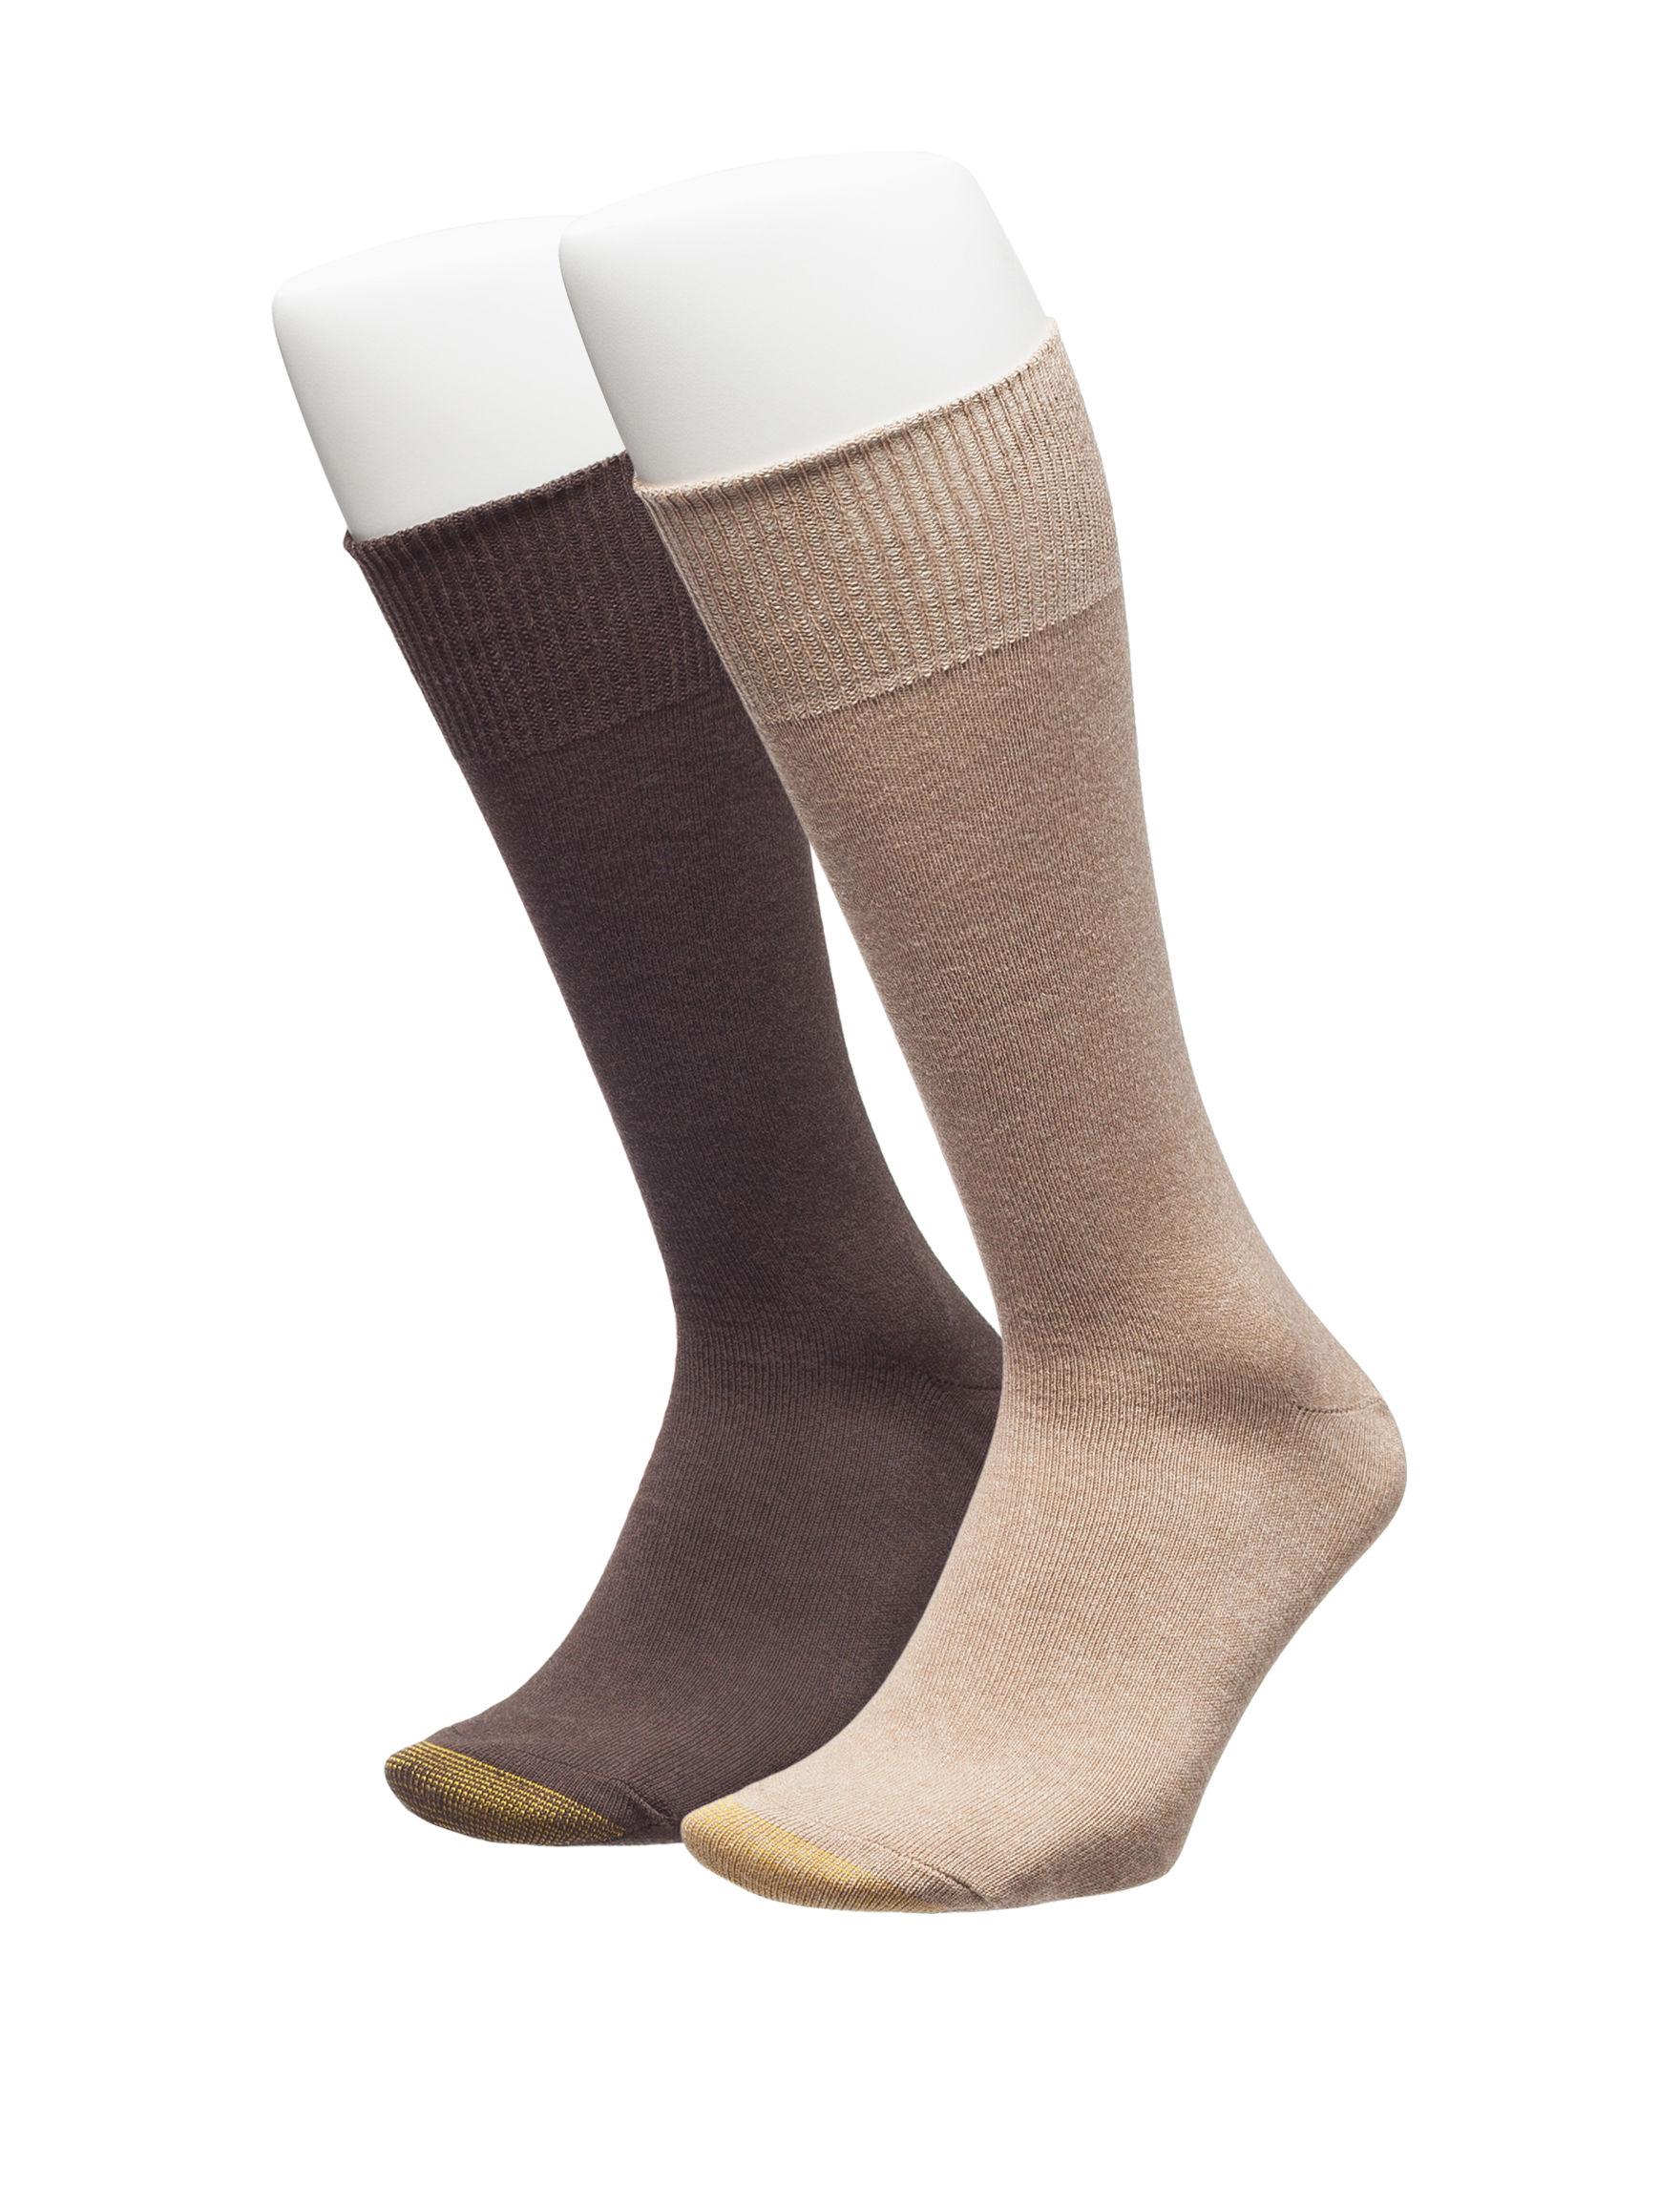 Gold Toe Ivory Socks